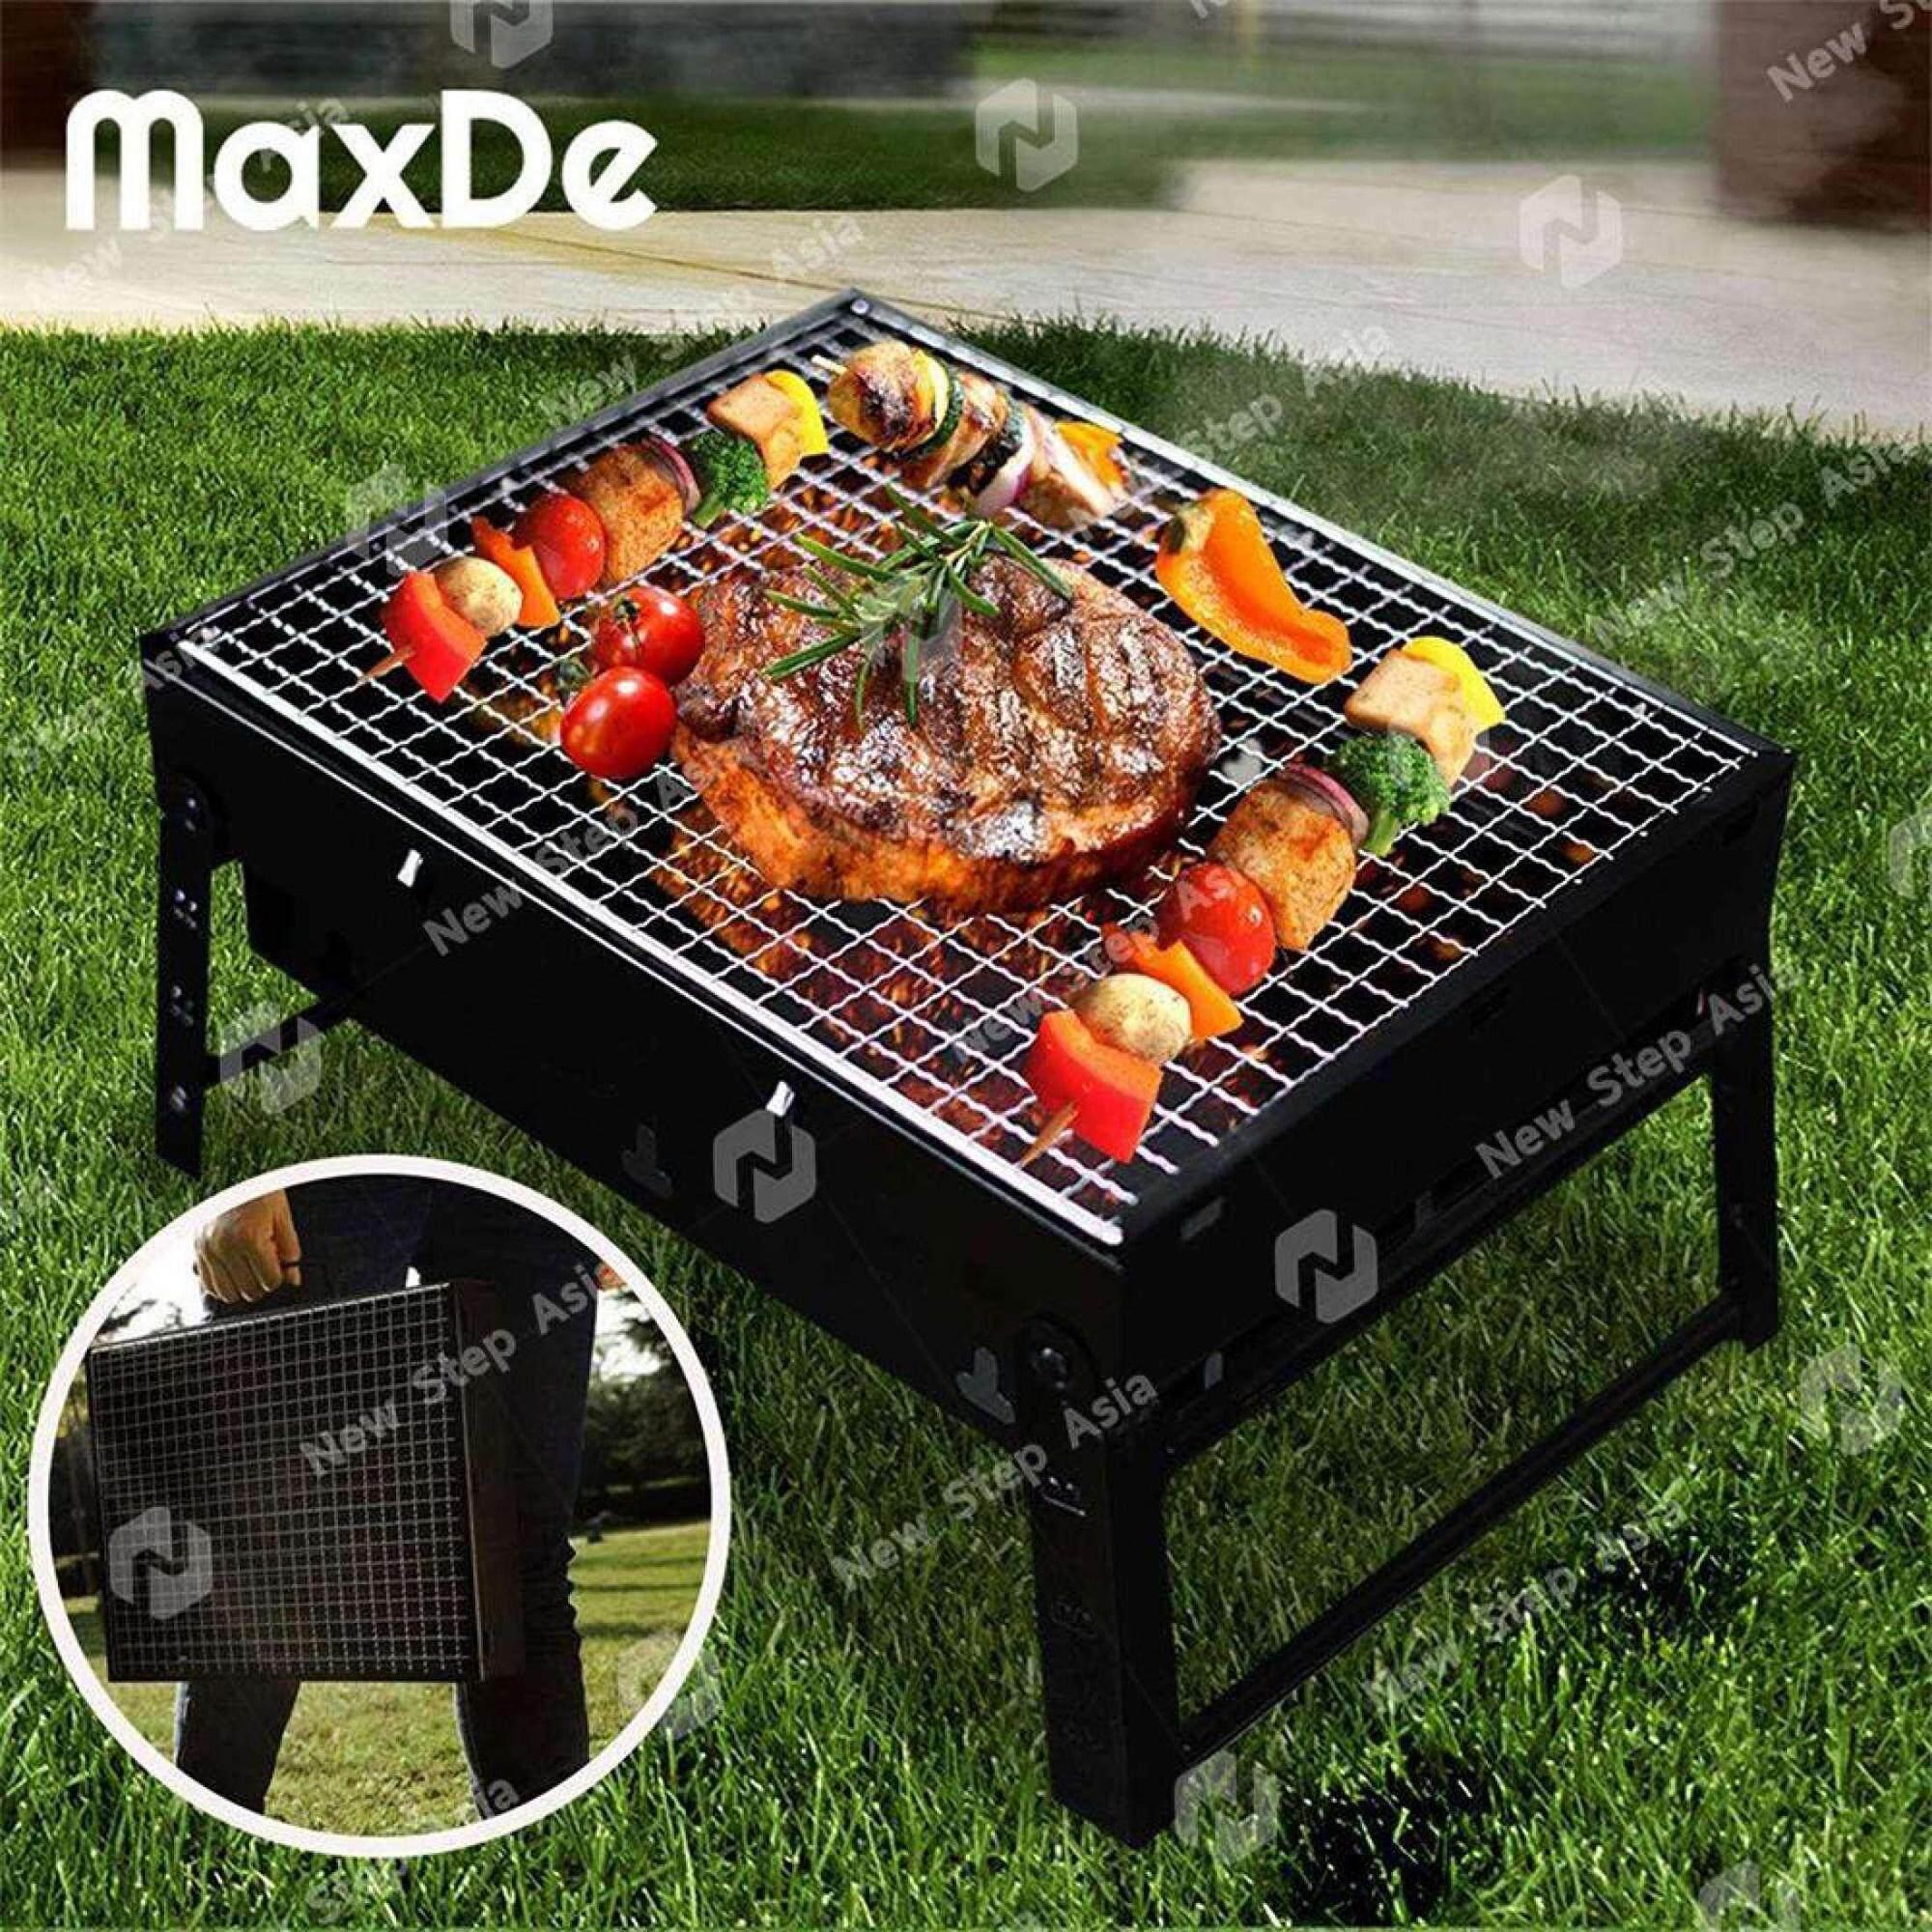 Maxde เตาปิ้งย่าง เตาปิ้งย่างพกพา เตาบาร์บีคิว เตาย่าง เตาบาร์บีคิว พับได้ น้ำหนักเบา เตาย่างบาร์บิคิว เตาย่างใช้ถ่าน เตาถ่านชารโคล Portable Grill Charcoal Bbq Barbecue รุ่น Bbq Eco New Step Asia